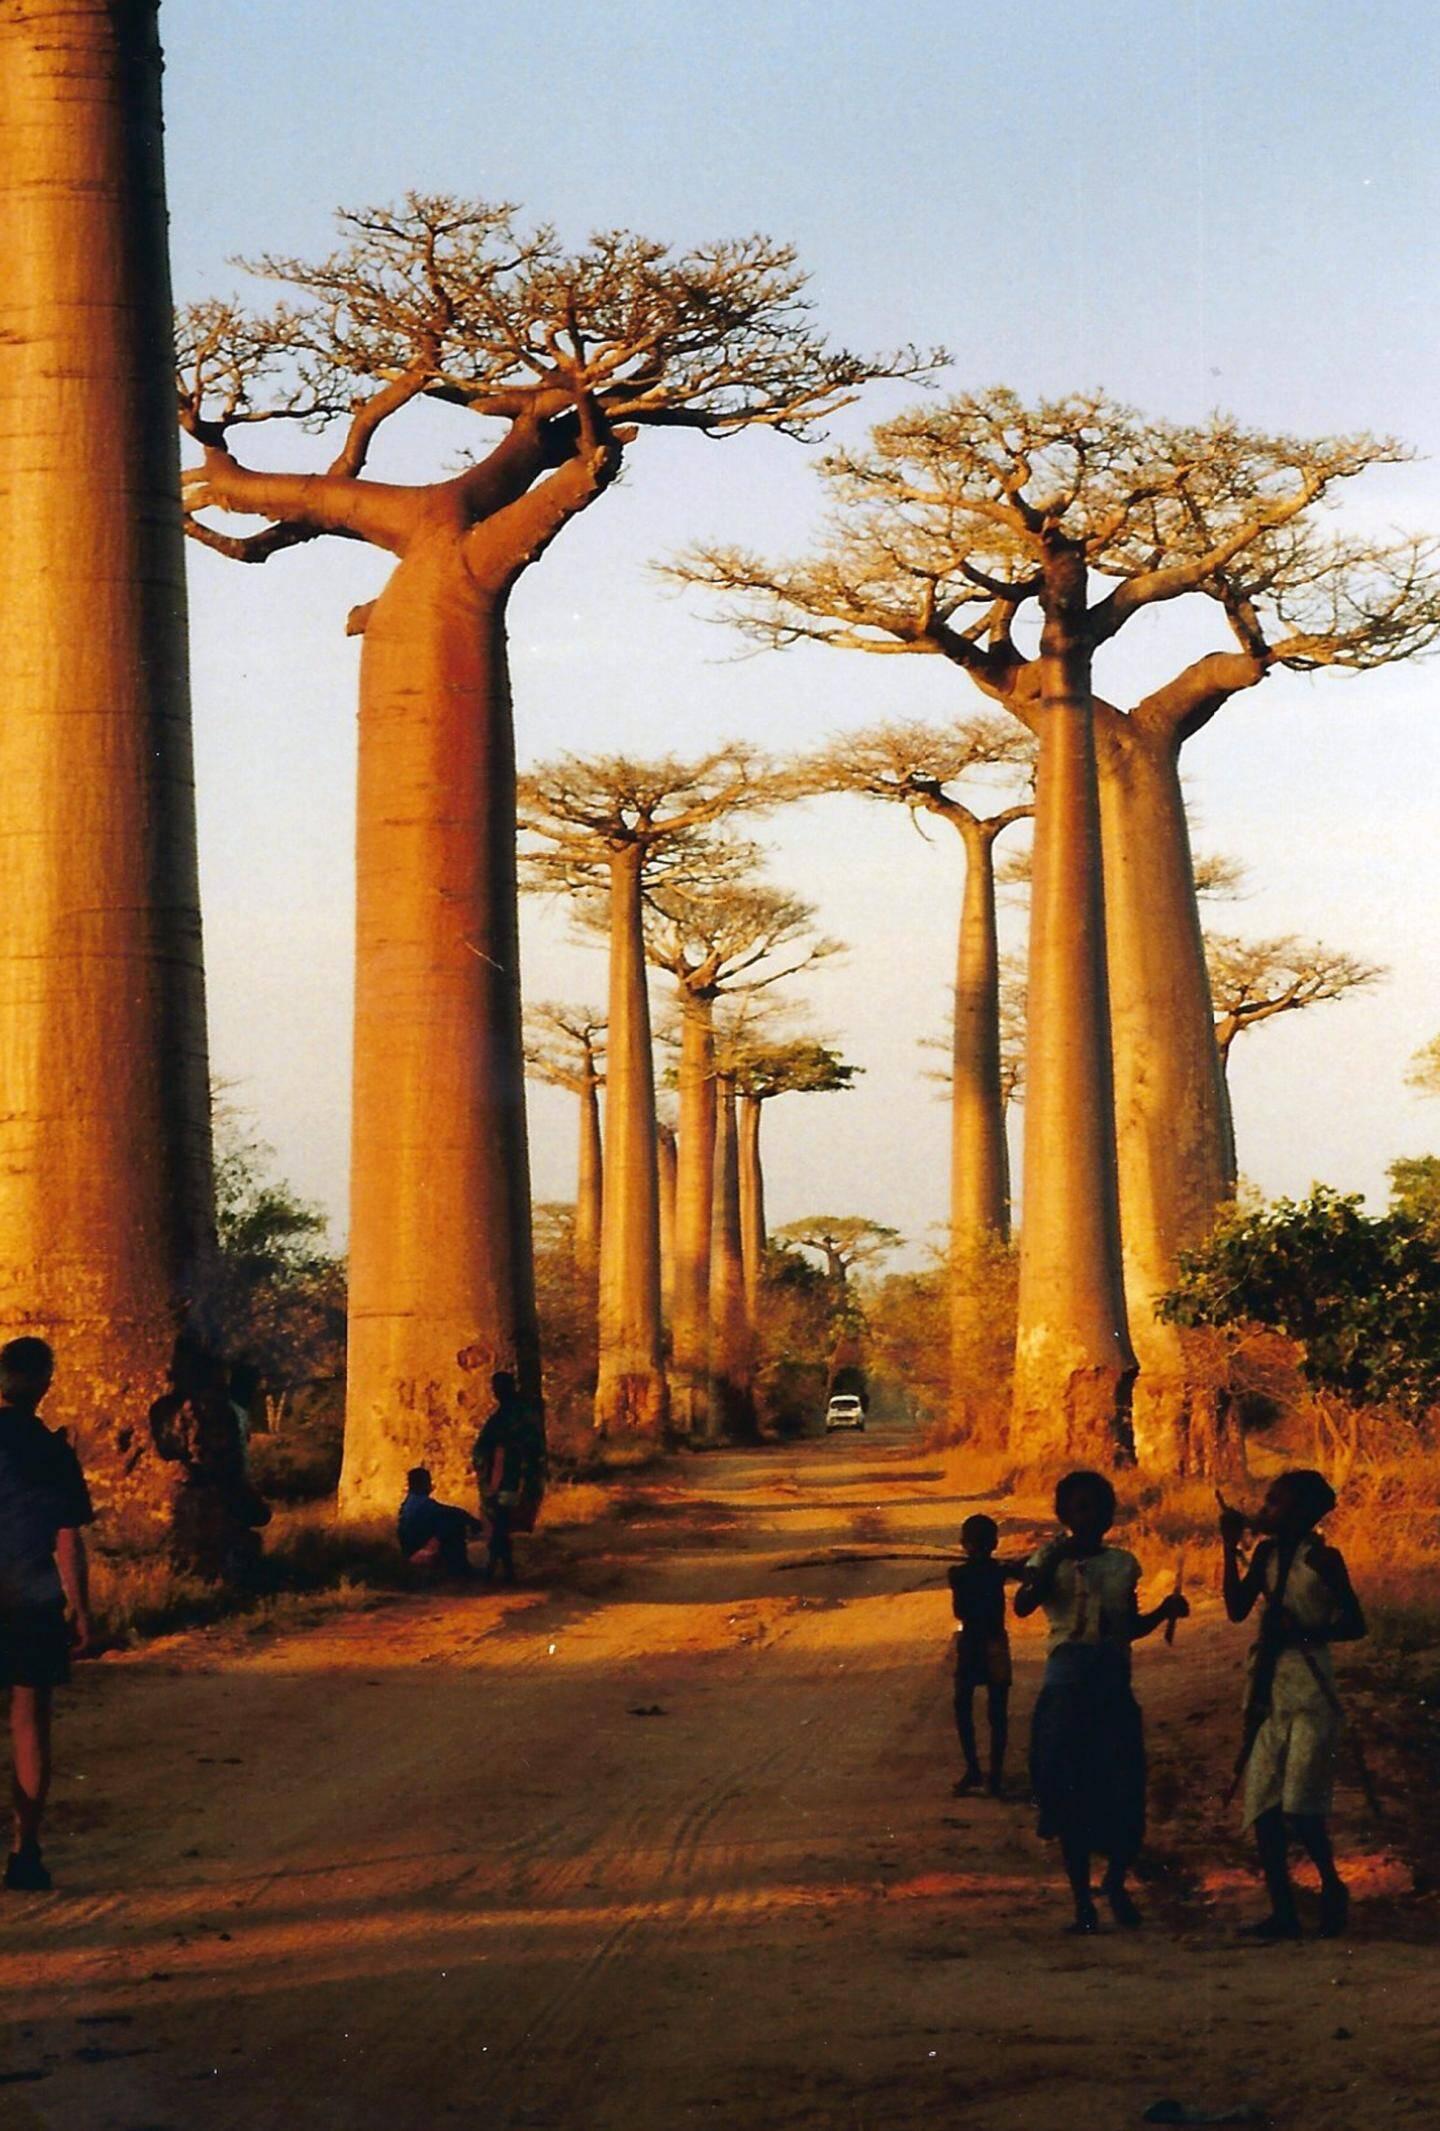 « Les baobabs » de Christiane Micquel (9e place).